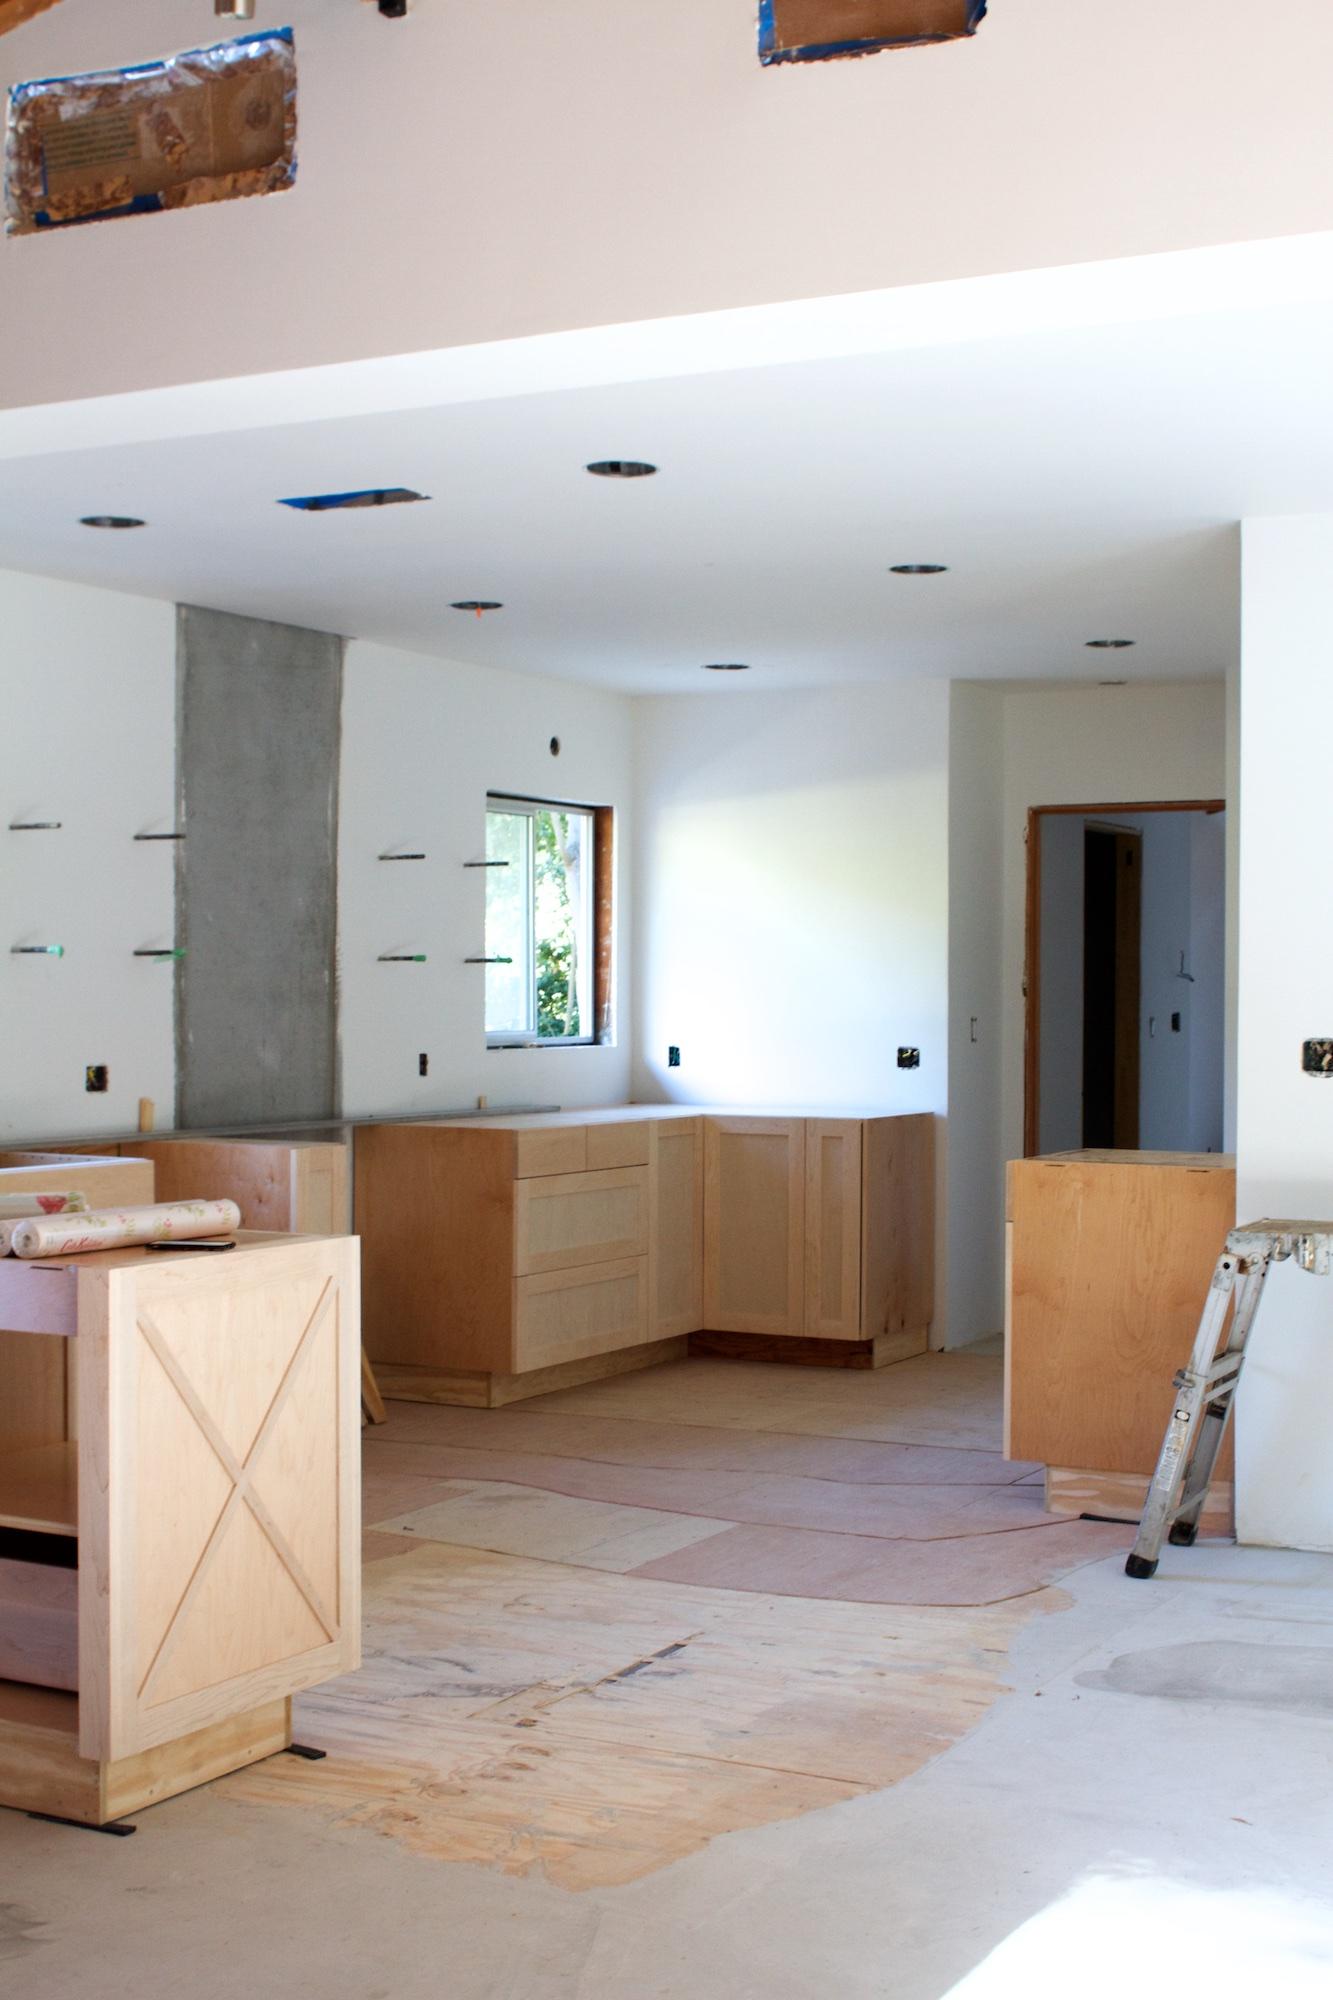 New kitchen cabinets and prep for backsplash